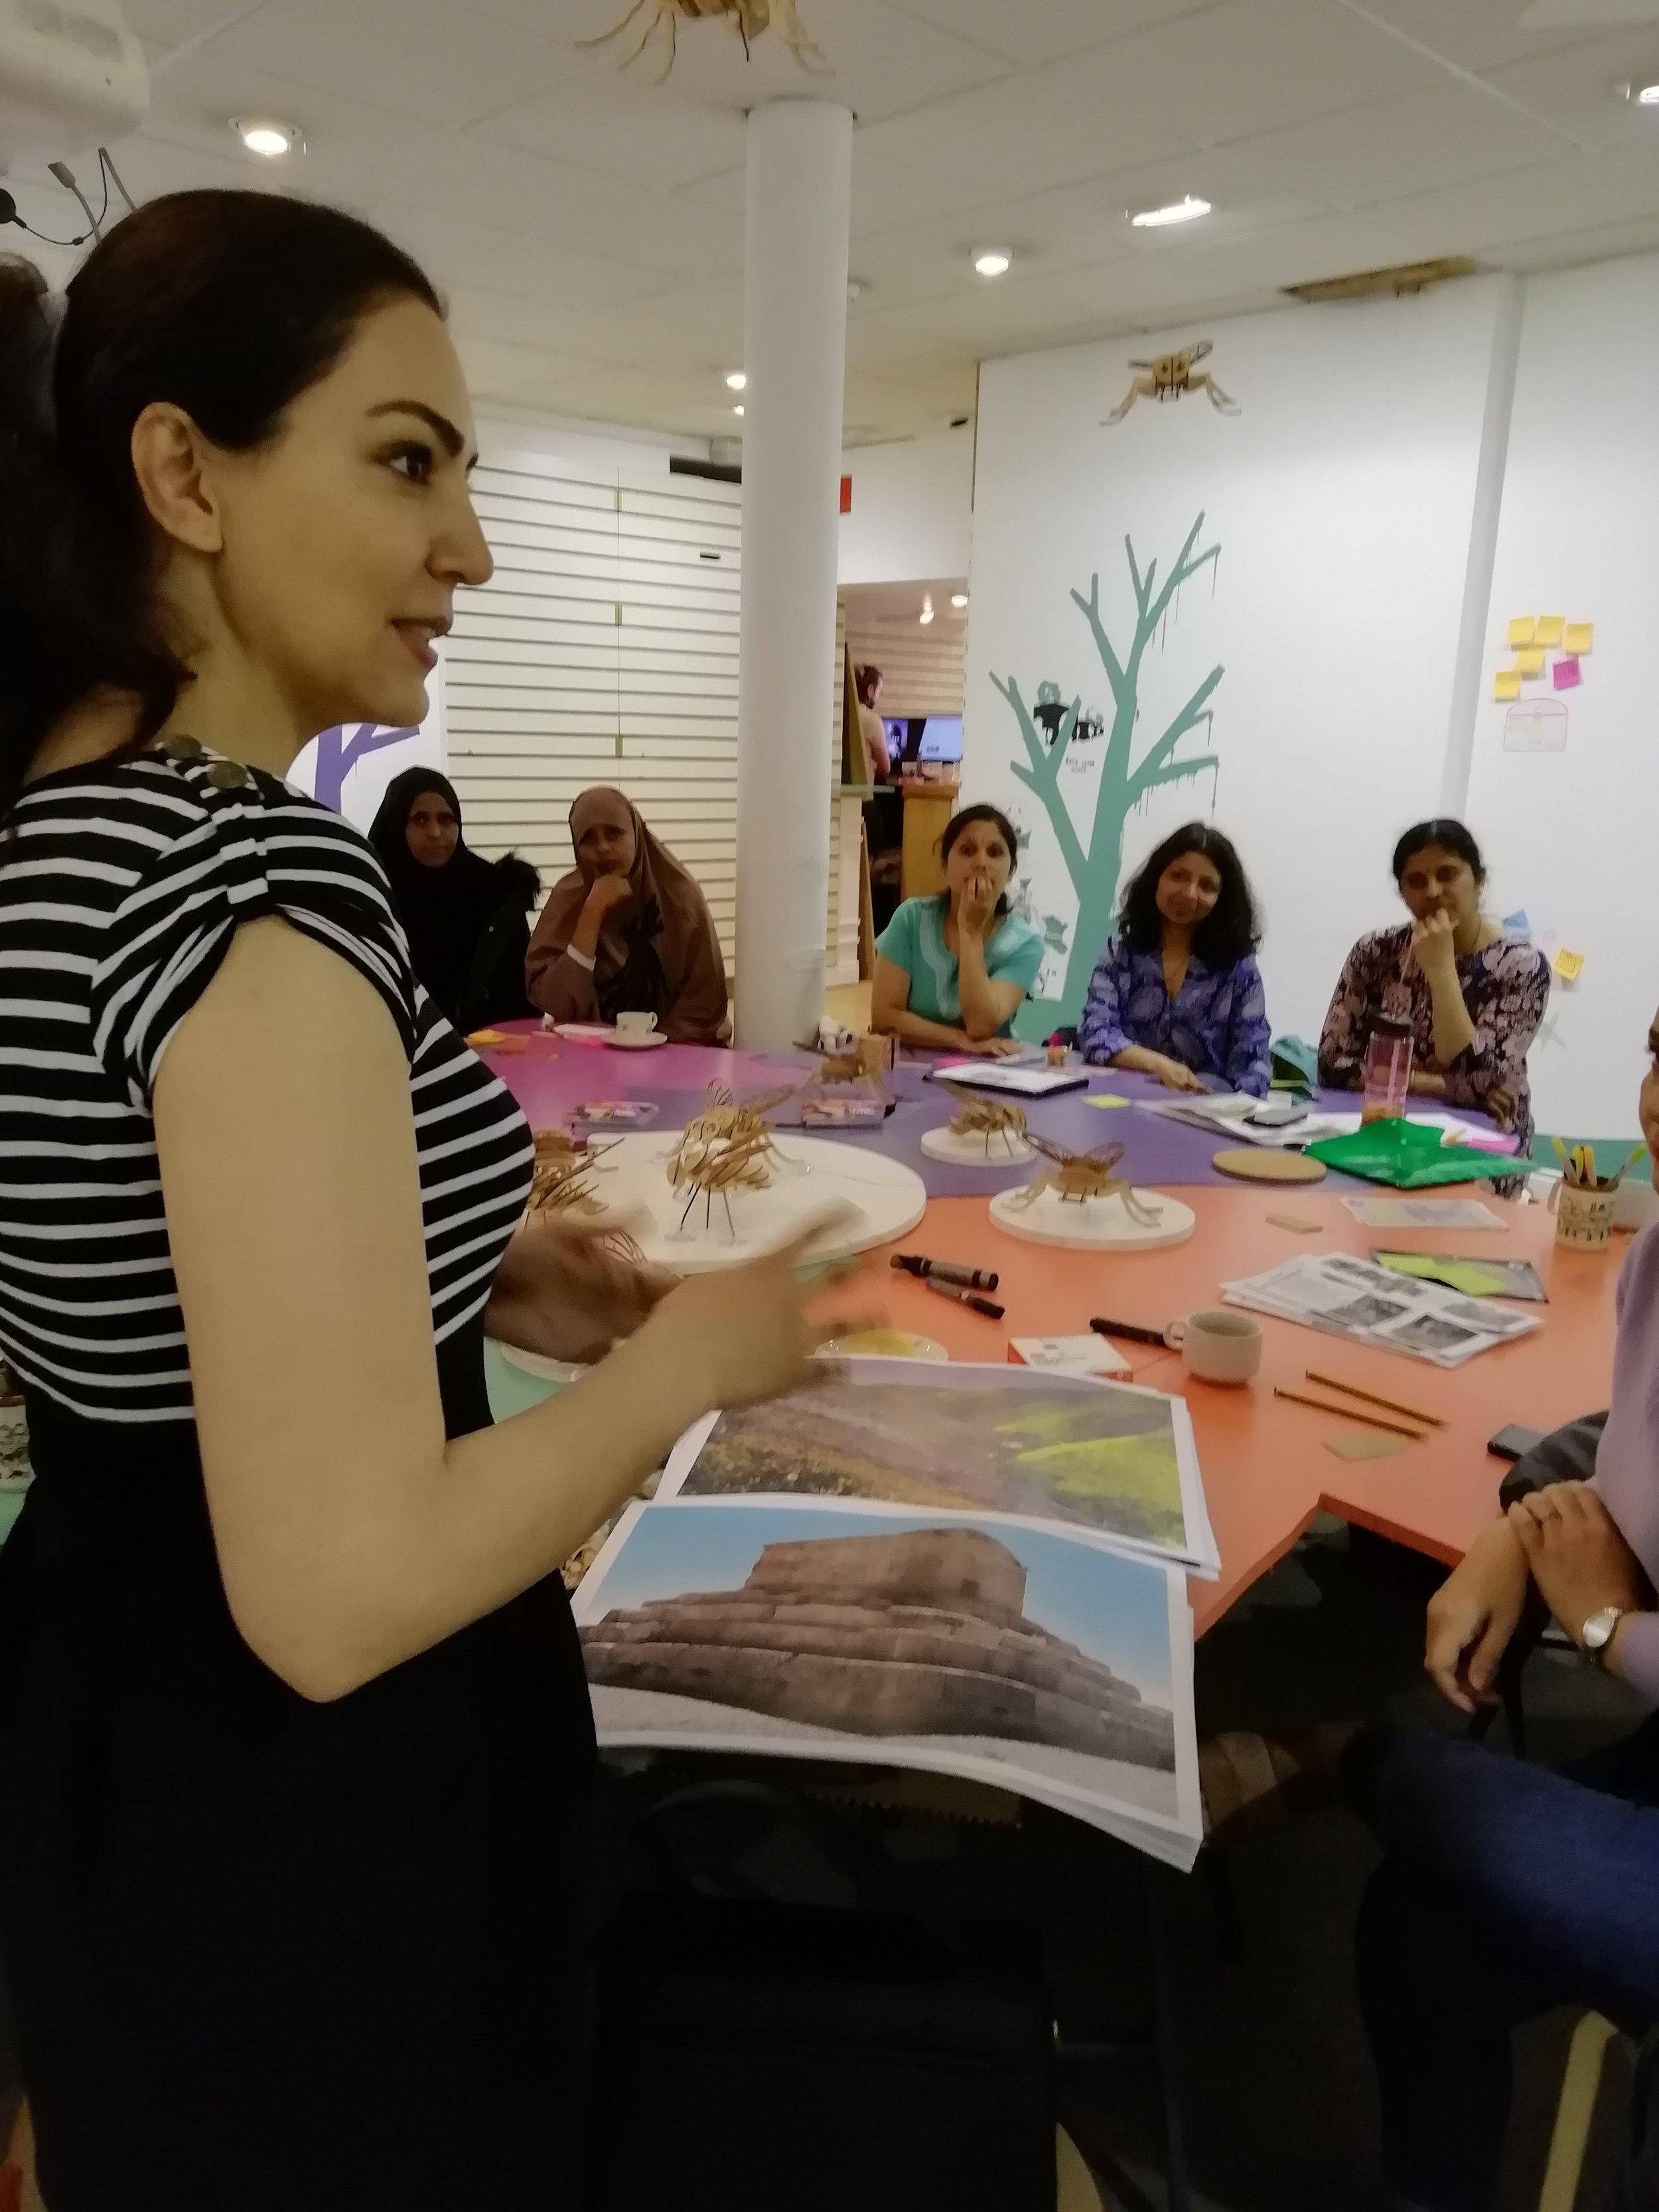 Discussing Persian heritage